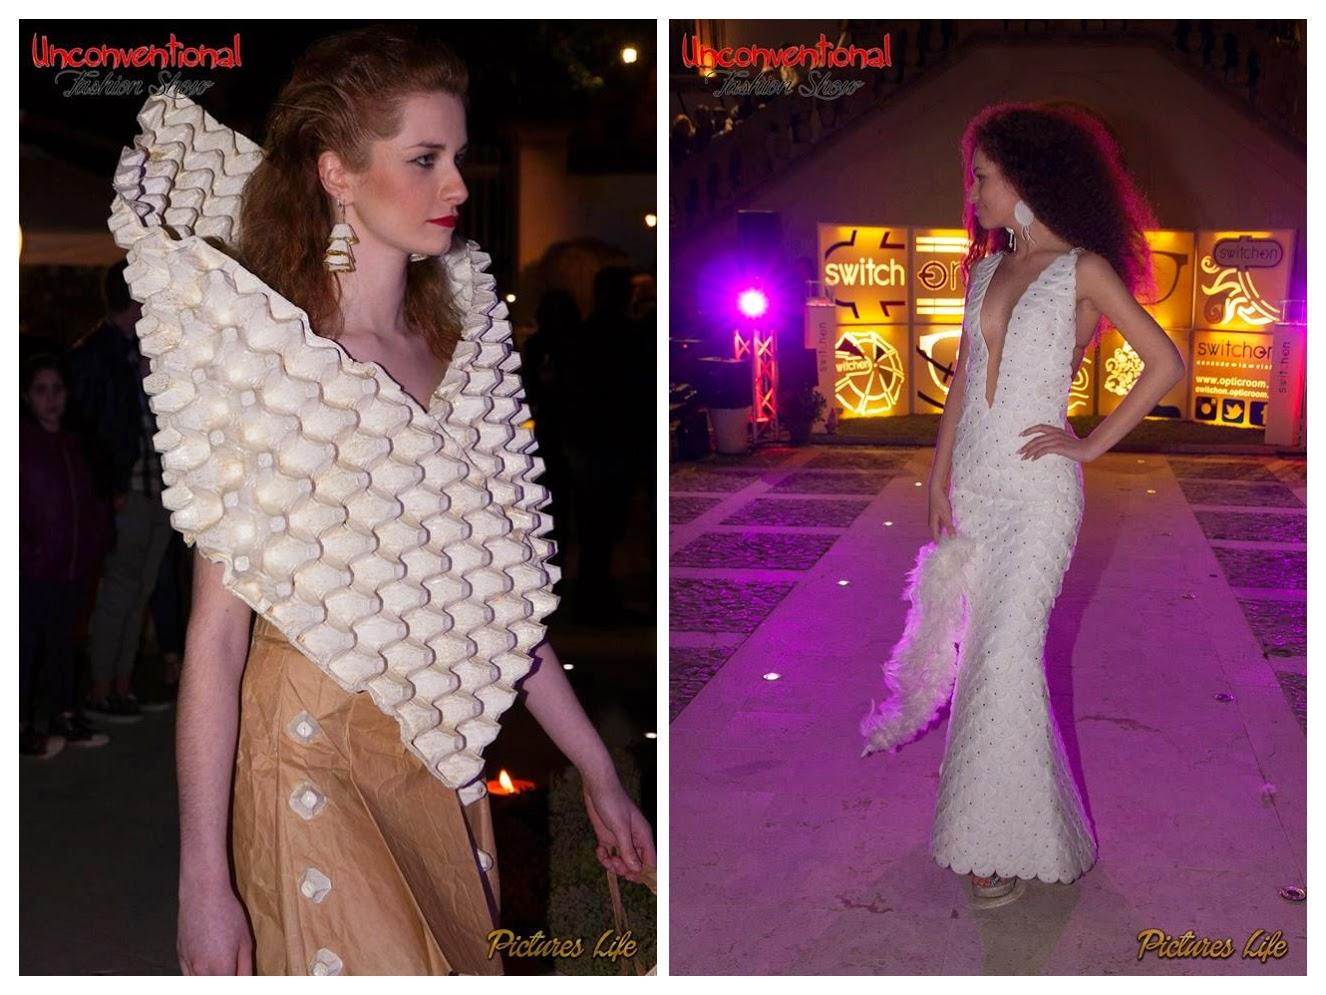 simone perricone, sps, passerella, sfilata, white, dress, stilista, fashion_designer, dress_recycling